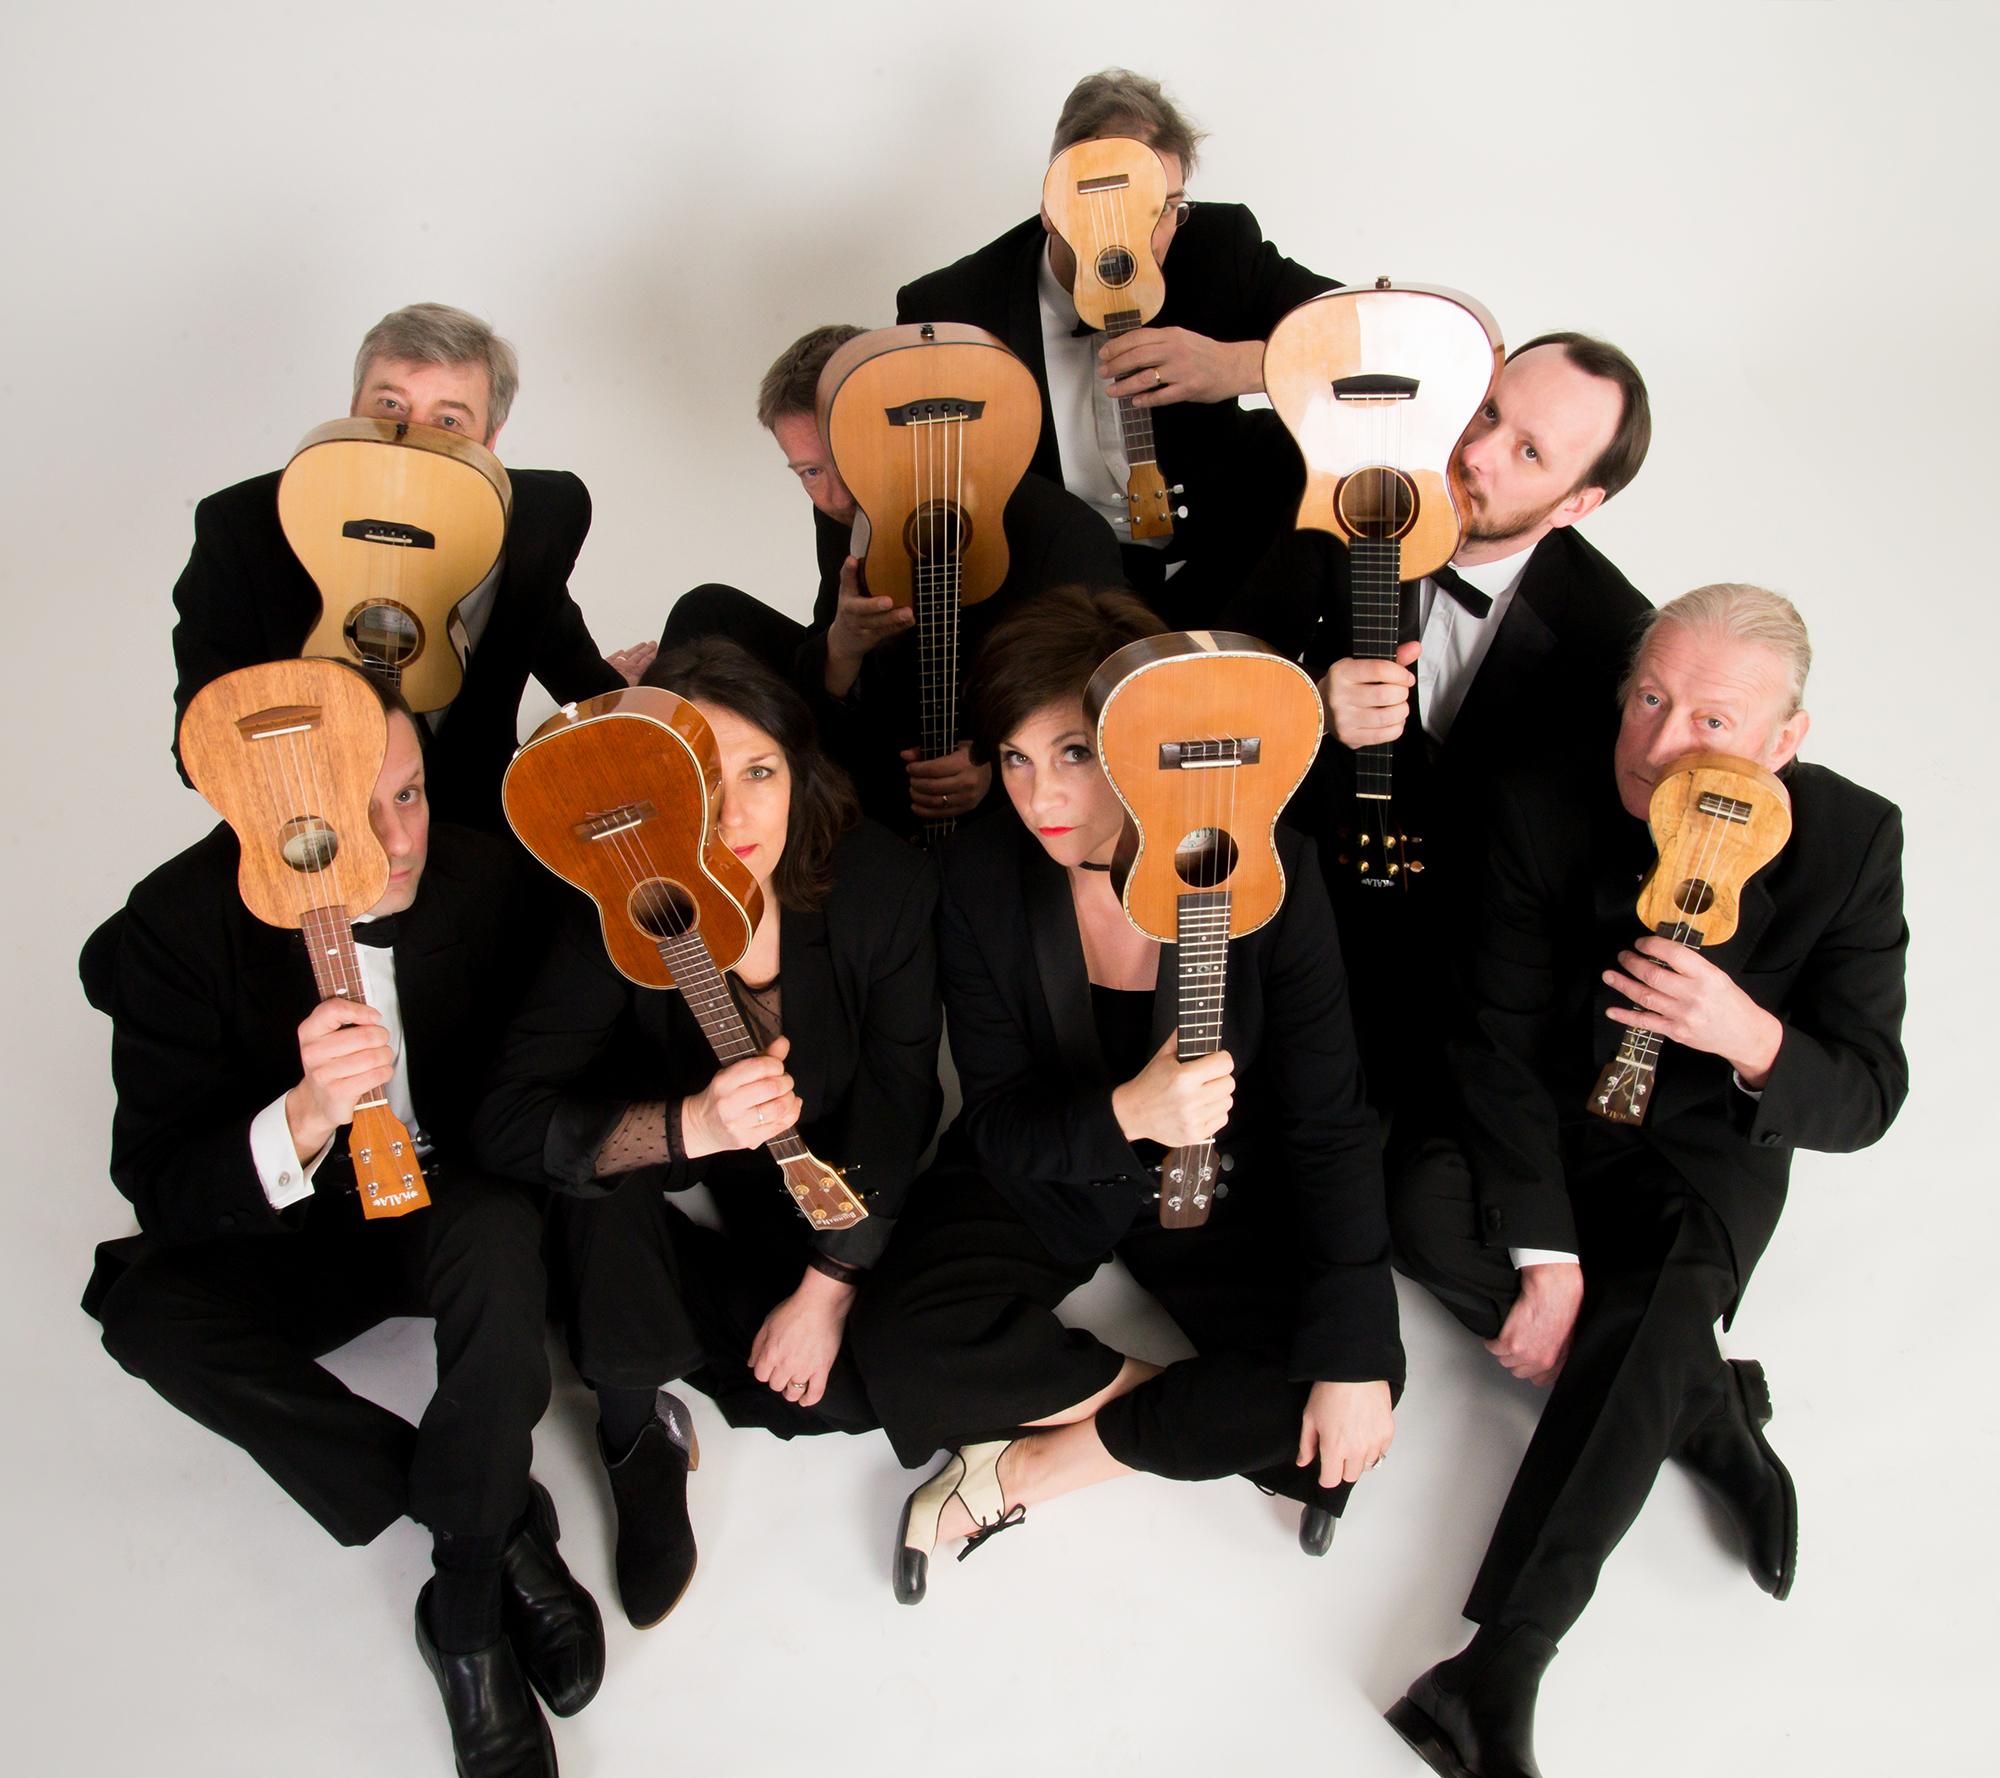 Ukulele Orchestra is no joke. See for yourself at Houston's Wortham Theater